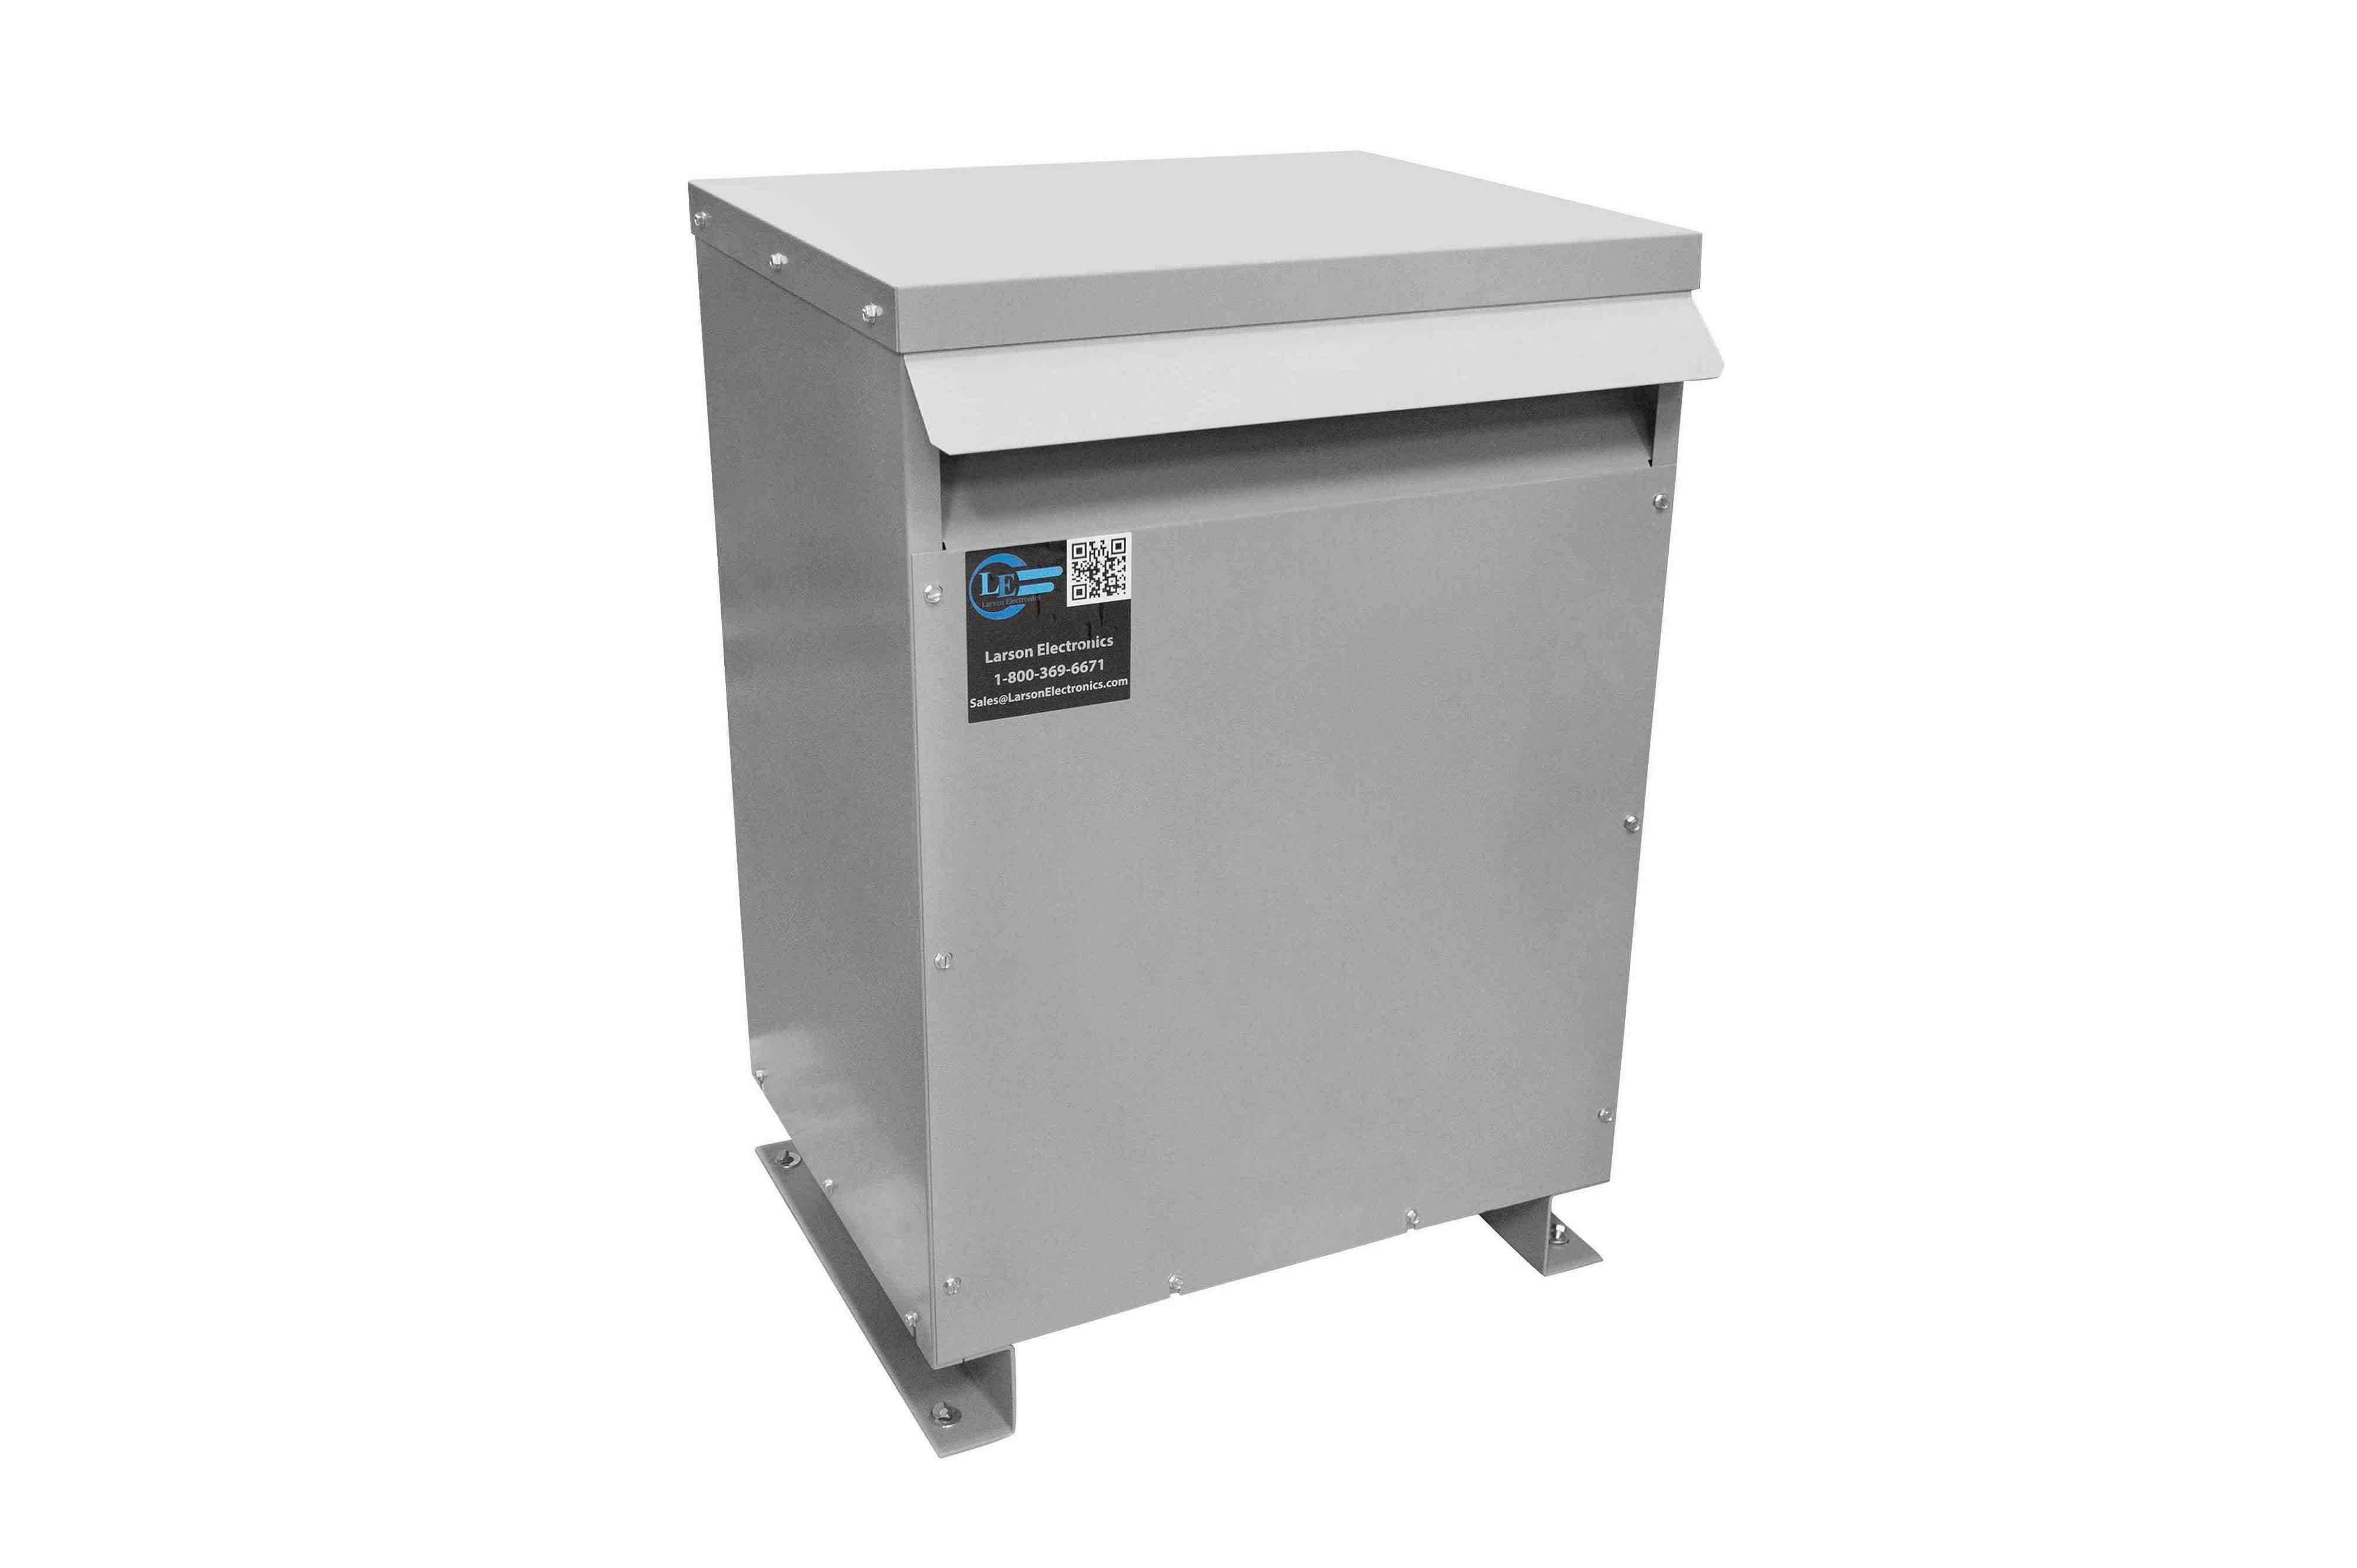 55 kVA 3PH Isolation Transformer, 380V Wye Primary, 480Y/277 Wye-N Secondary, N3R, Ventilated, 60 Hz